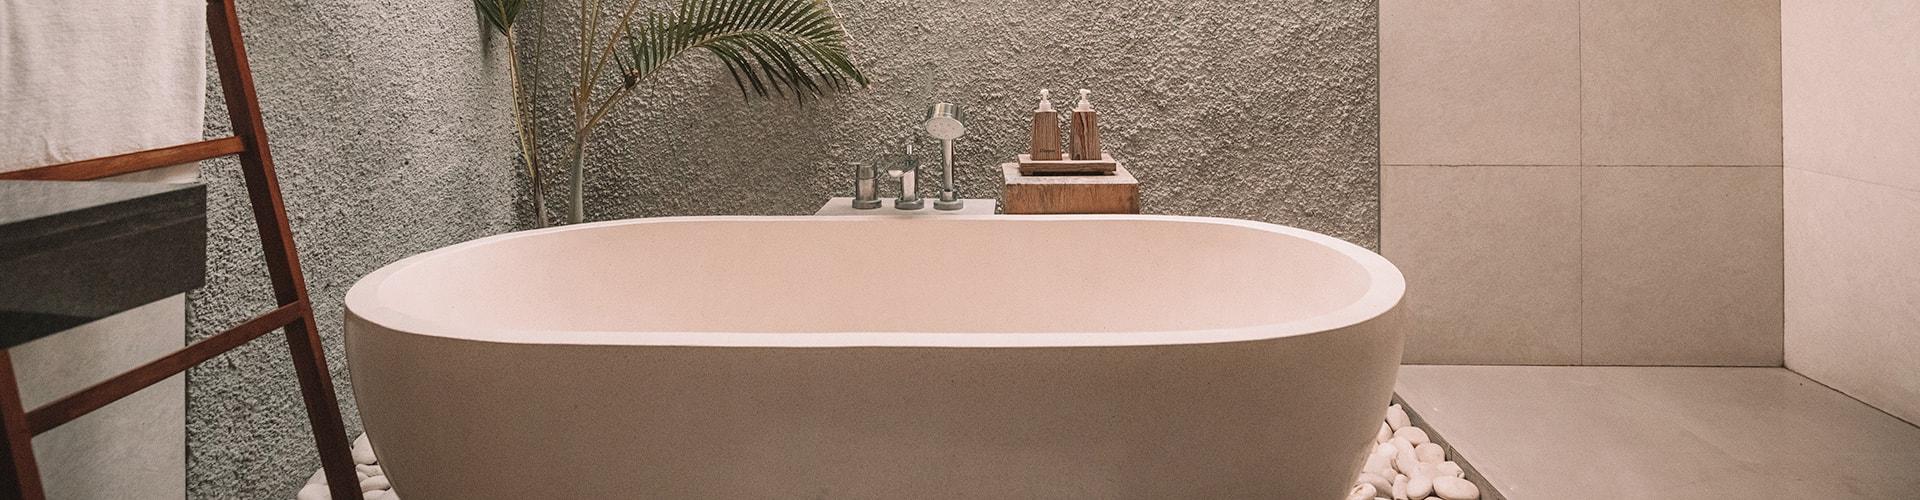 mesdevis.ch | Rénovation salle de bain